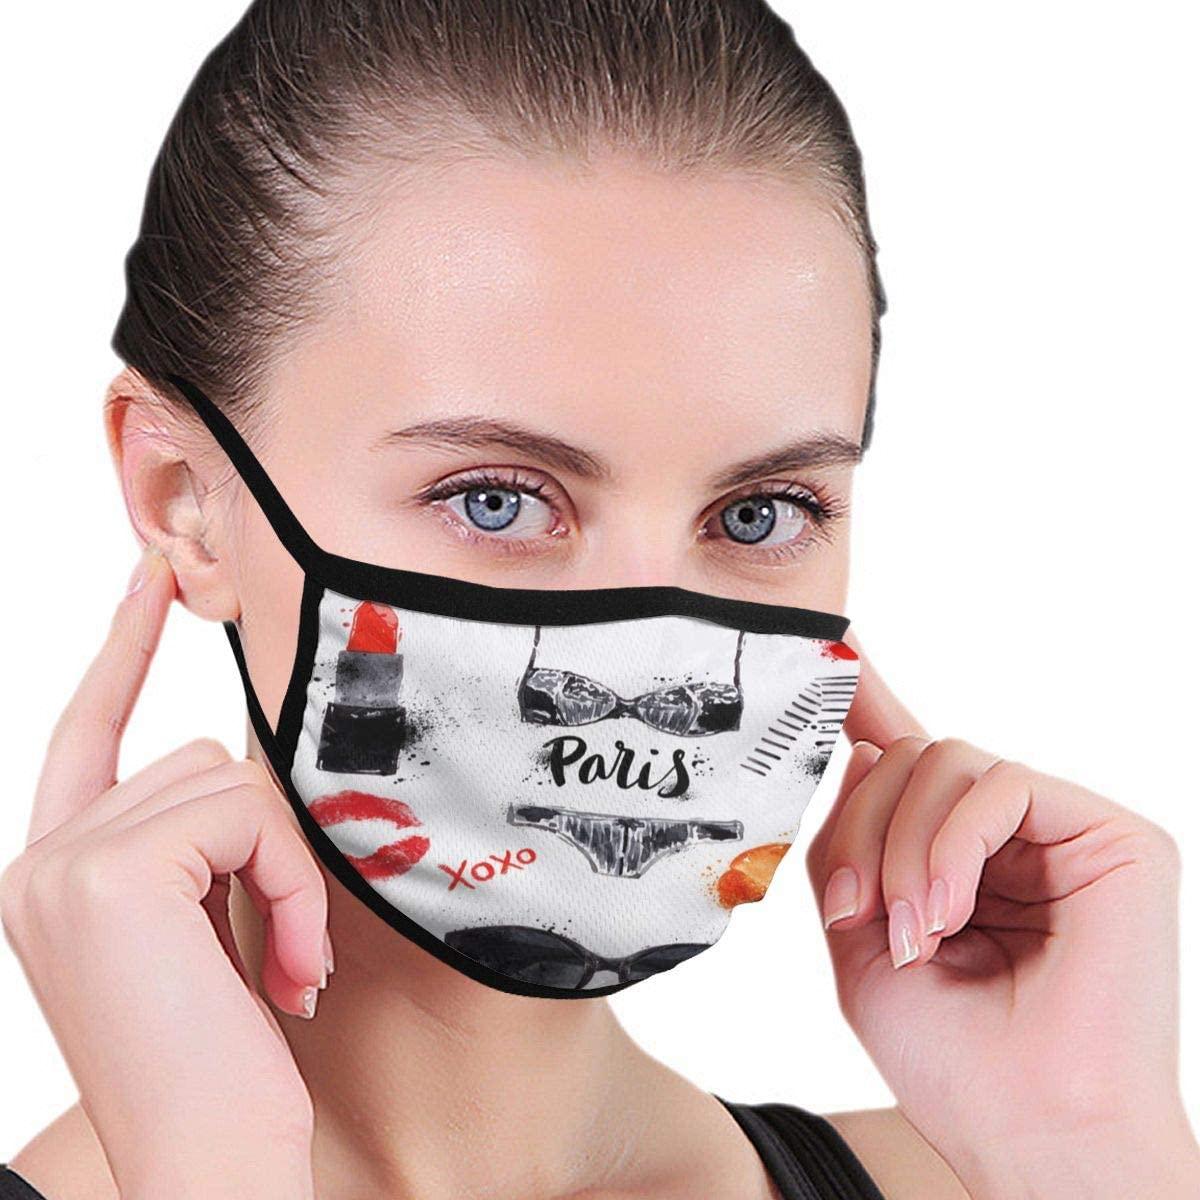 Doumku Mouth Cover Eiffel Tower Glasses Lipstick Shoes Lingerie Dust Breathable Reusable Ear Loop Mouth Protection Cover For Men Women